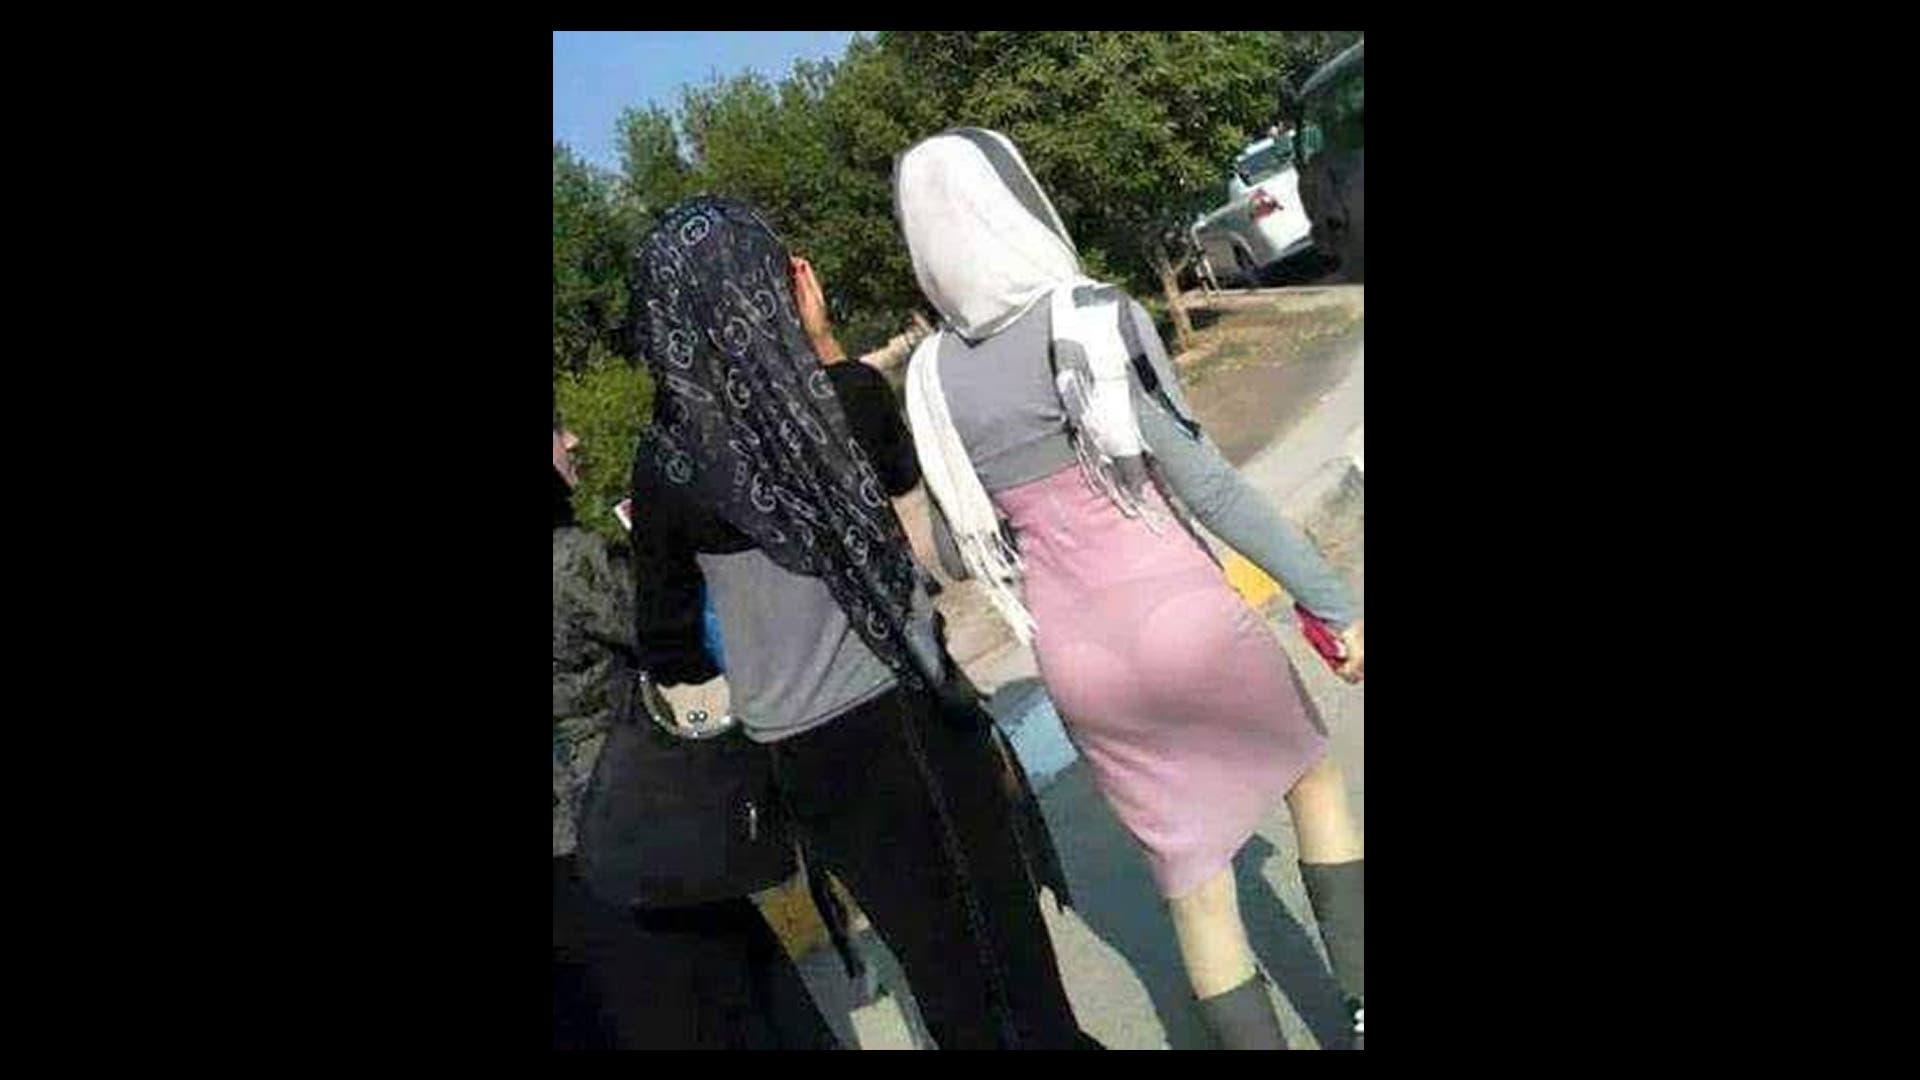 Sexy image muslim 35 Most